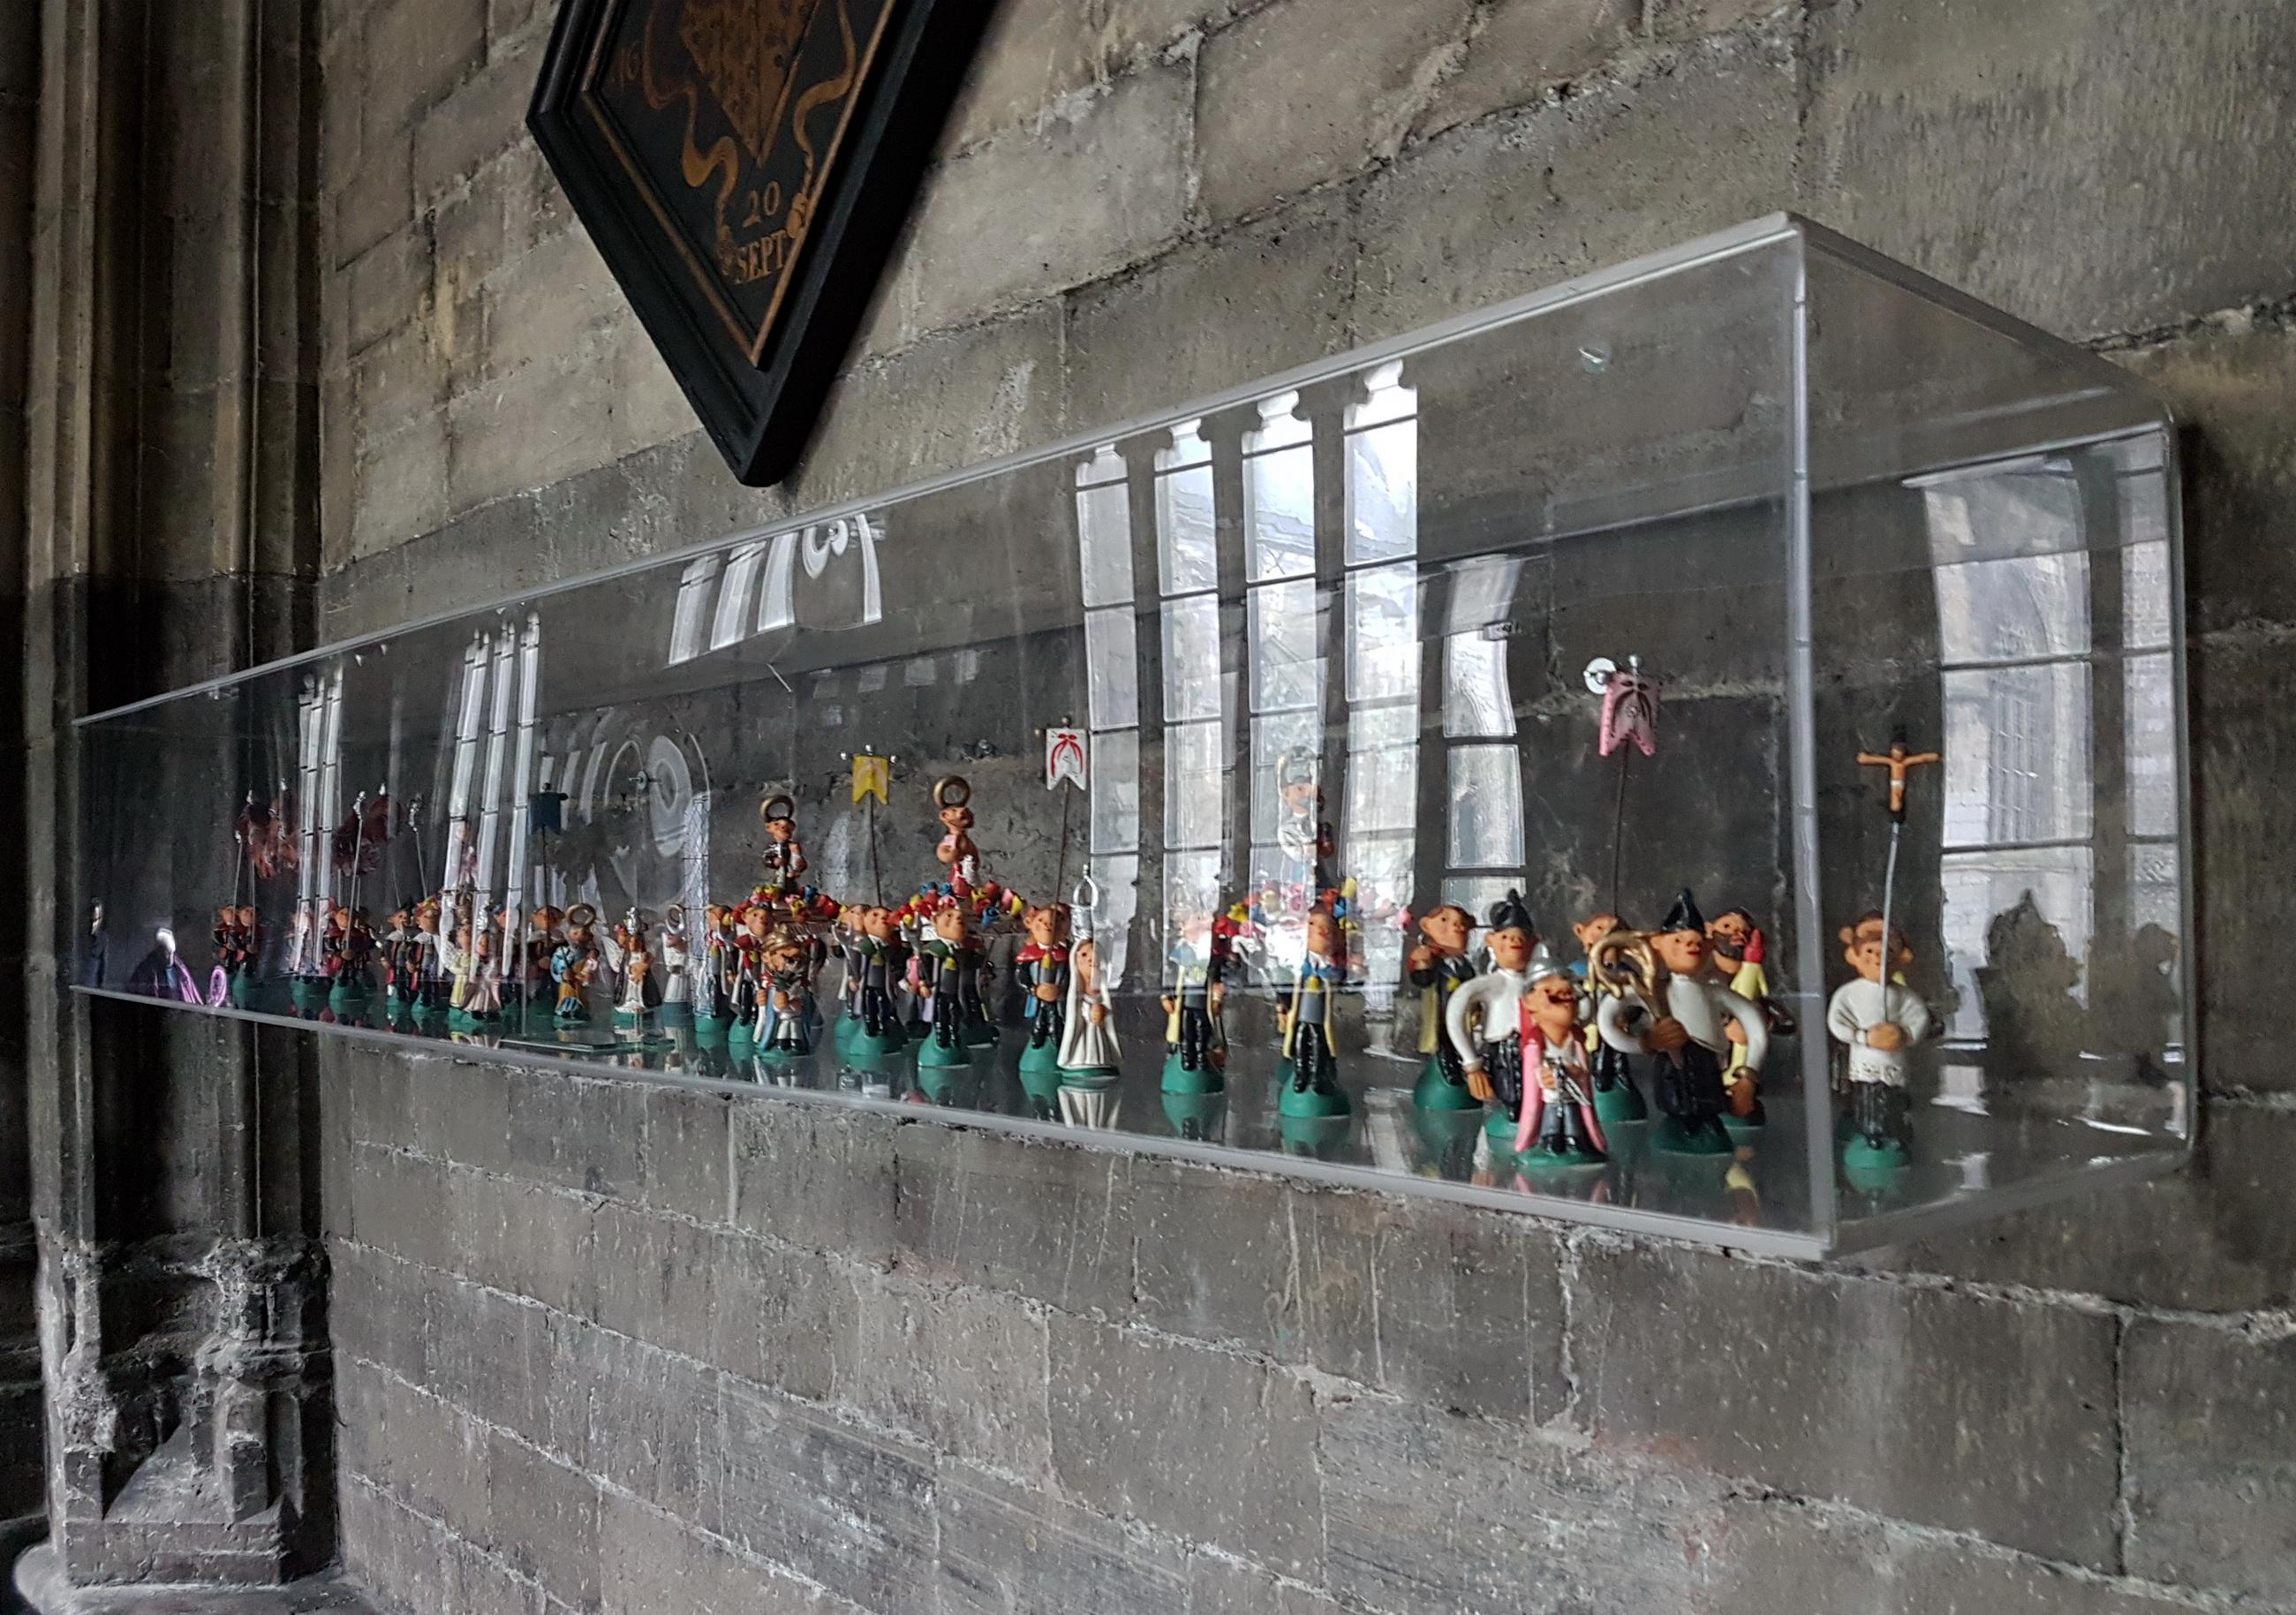 File:maastricht olv basiliek kruisgang ingang schatkamer